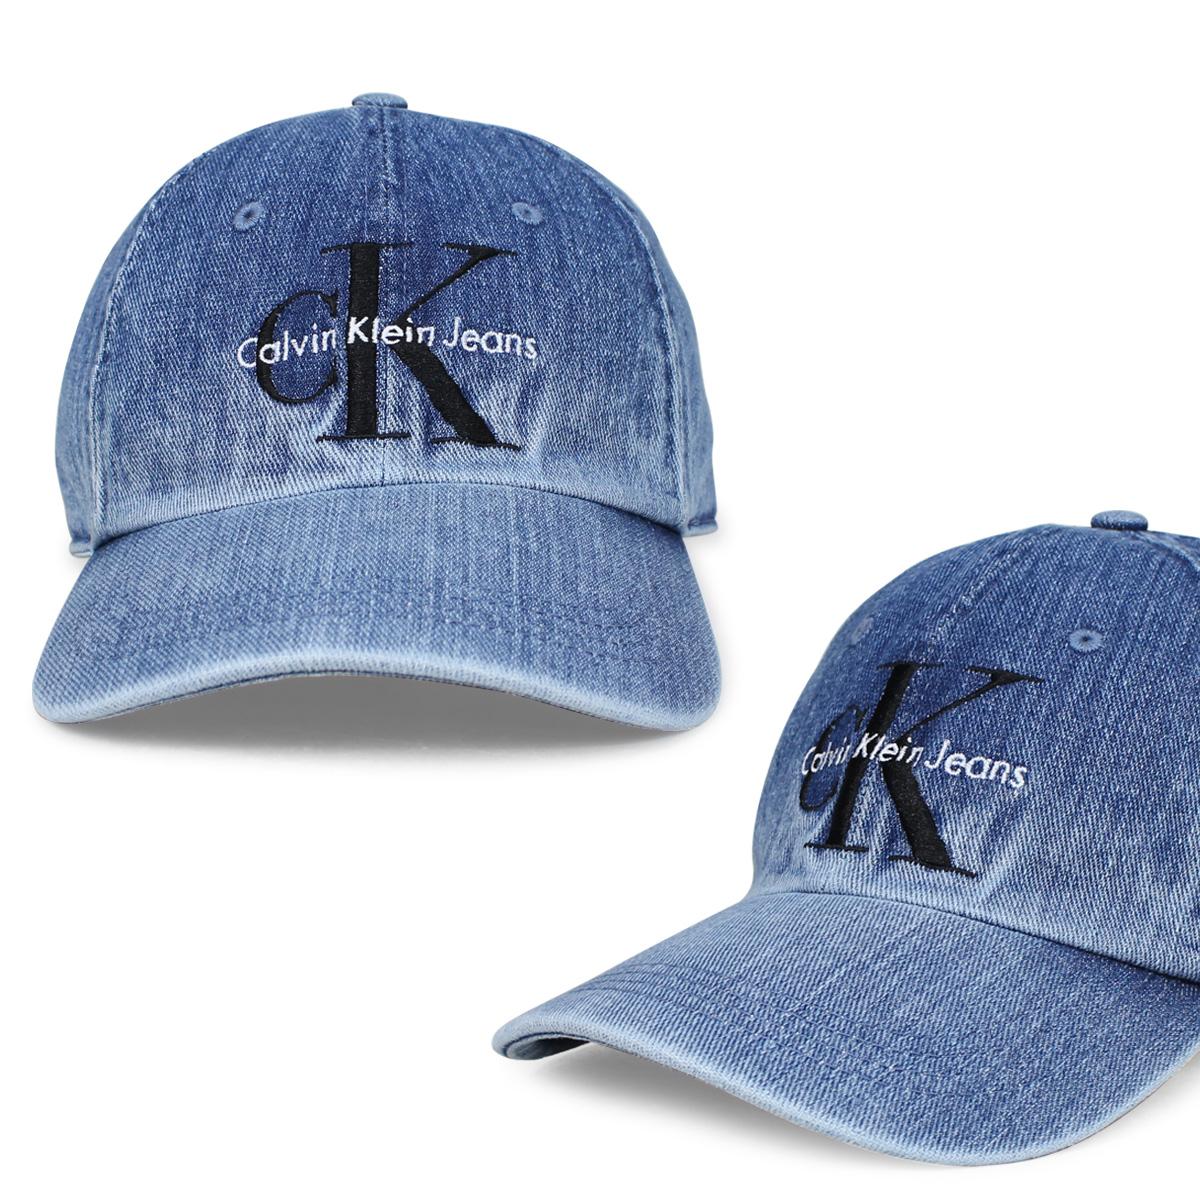 ALLSPORTS  Calvin Klein Jeans SPECIALITY CAP Calvin Klein jeans cap hat men  gap Dis blue 41VH900  6 20 Shinnyu load   186   ca4c8340d7a